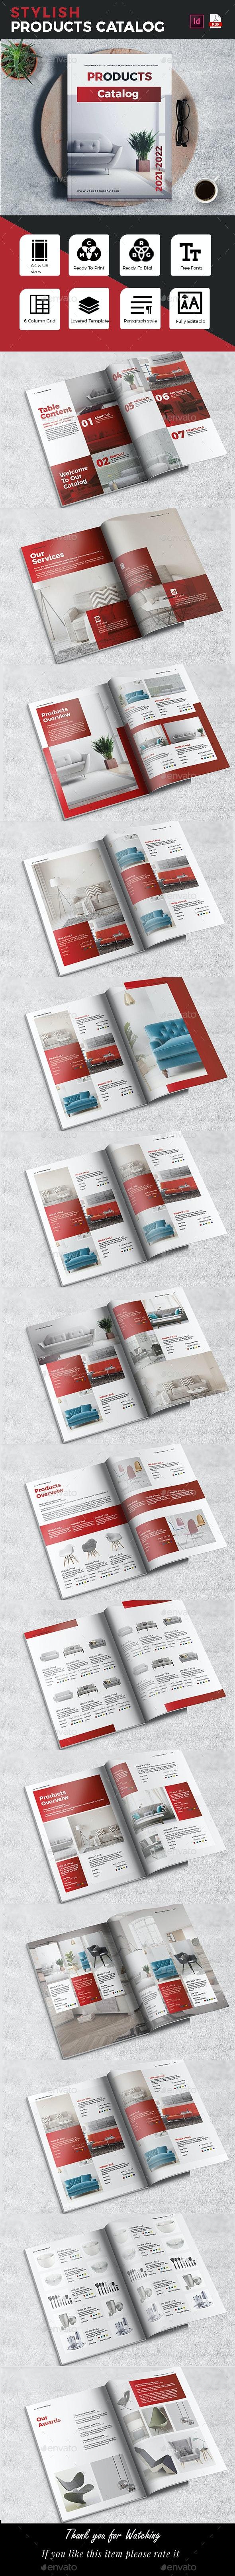 Elegant Products Catalog - Catalogs Brochures